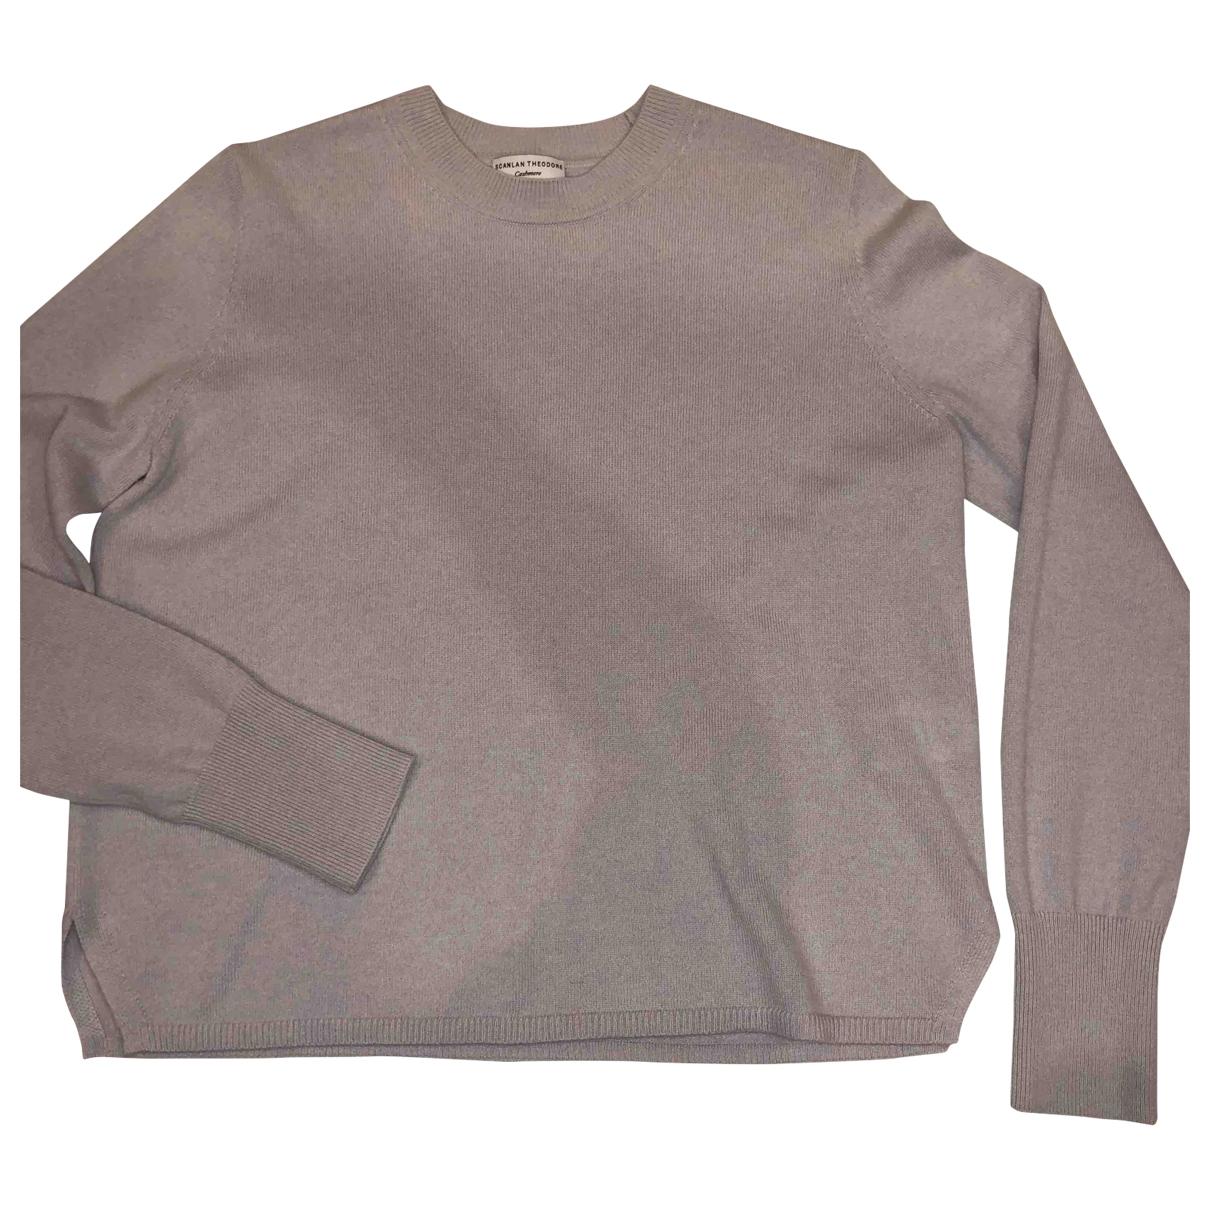 Scanlan & Theodore \N Grey Cashmere Knitwear for Women M International